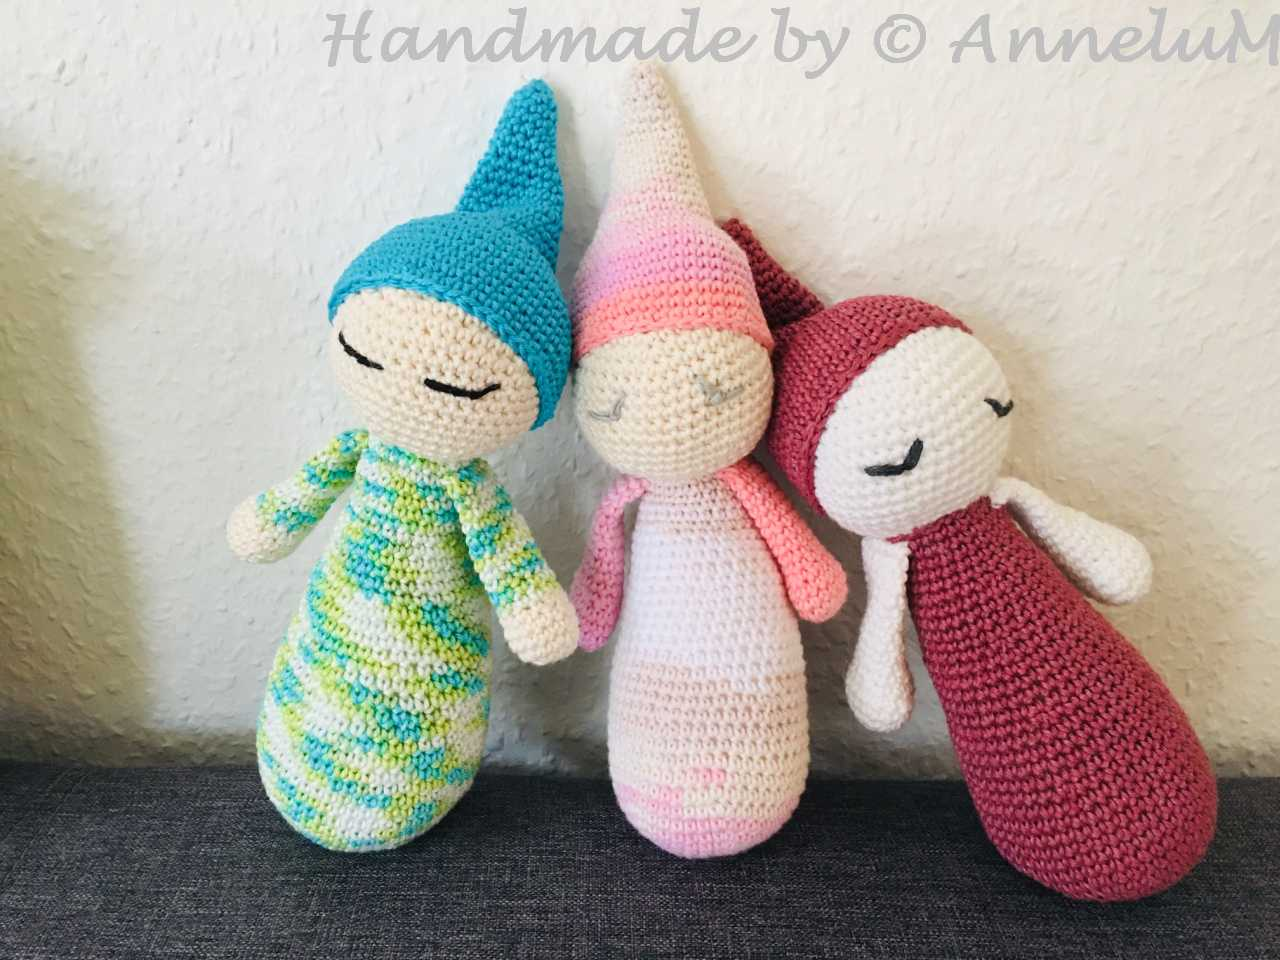 Amigurumis Handmade by AnneluM